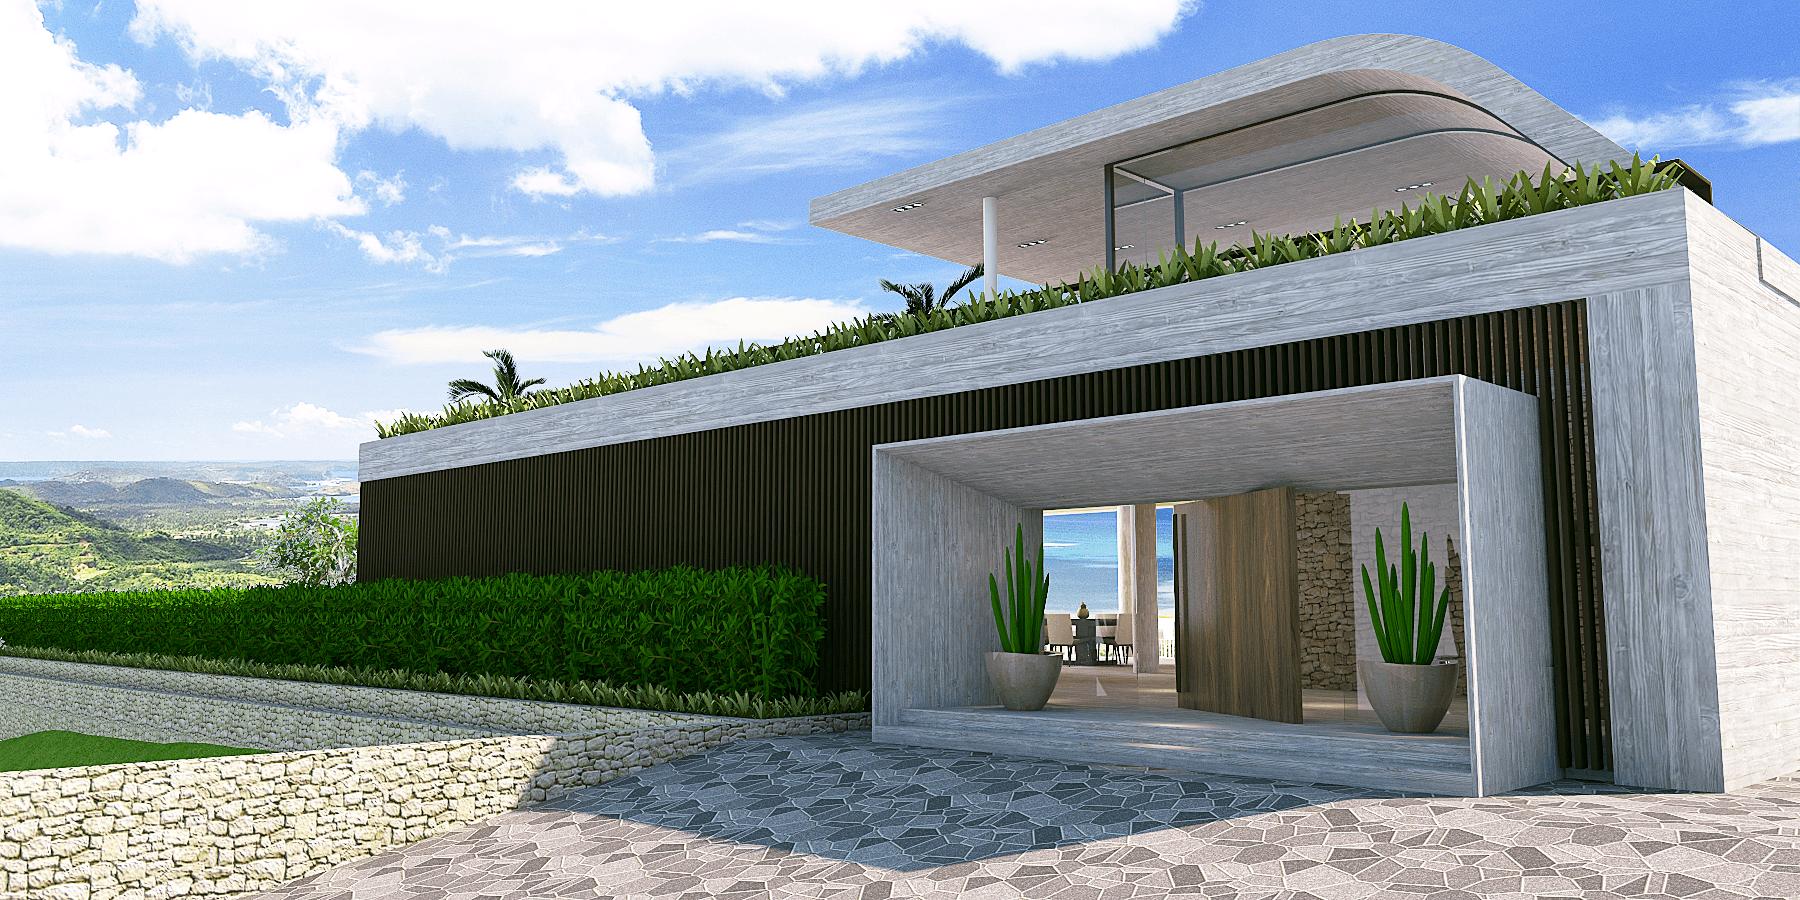 Pt. Indodesign Kreasi Mandiri Lombok Hotel South Lombok Kuta South Lombok Kuta 0000Llclub-3D-Renderview-1-R2  <P>Club Lounge</p> 16090